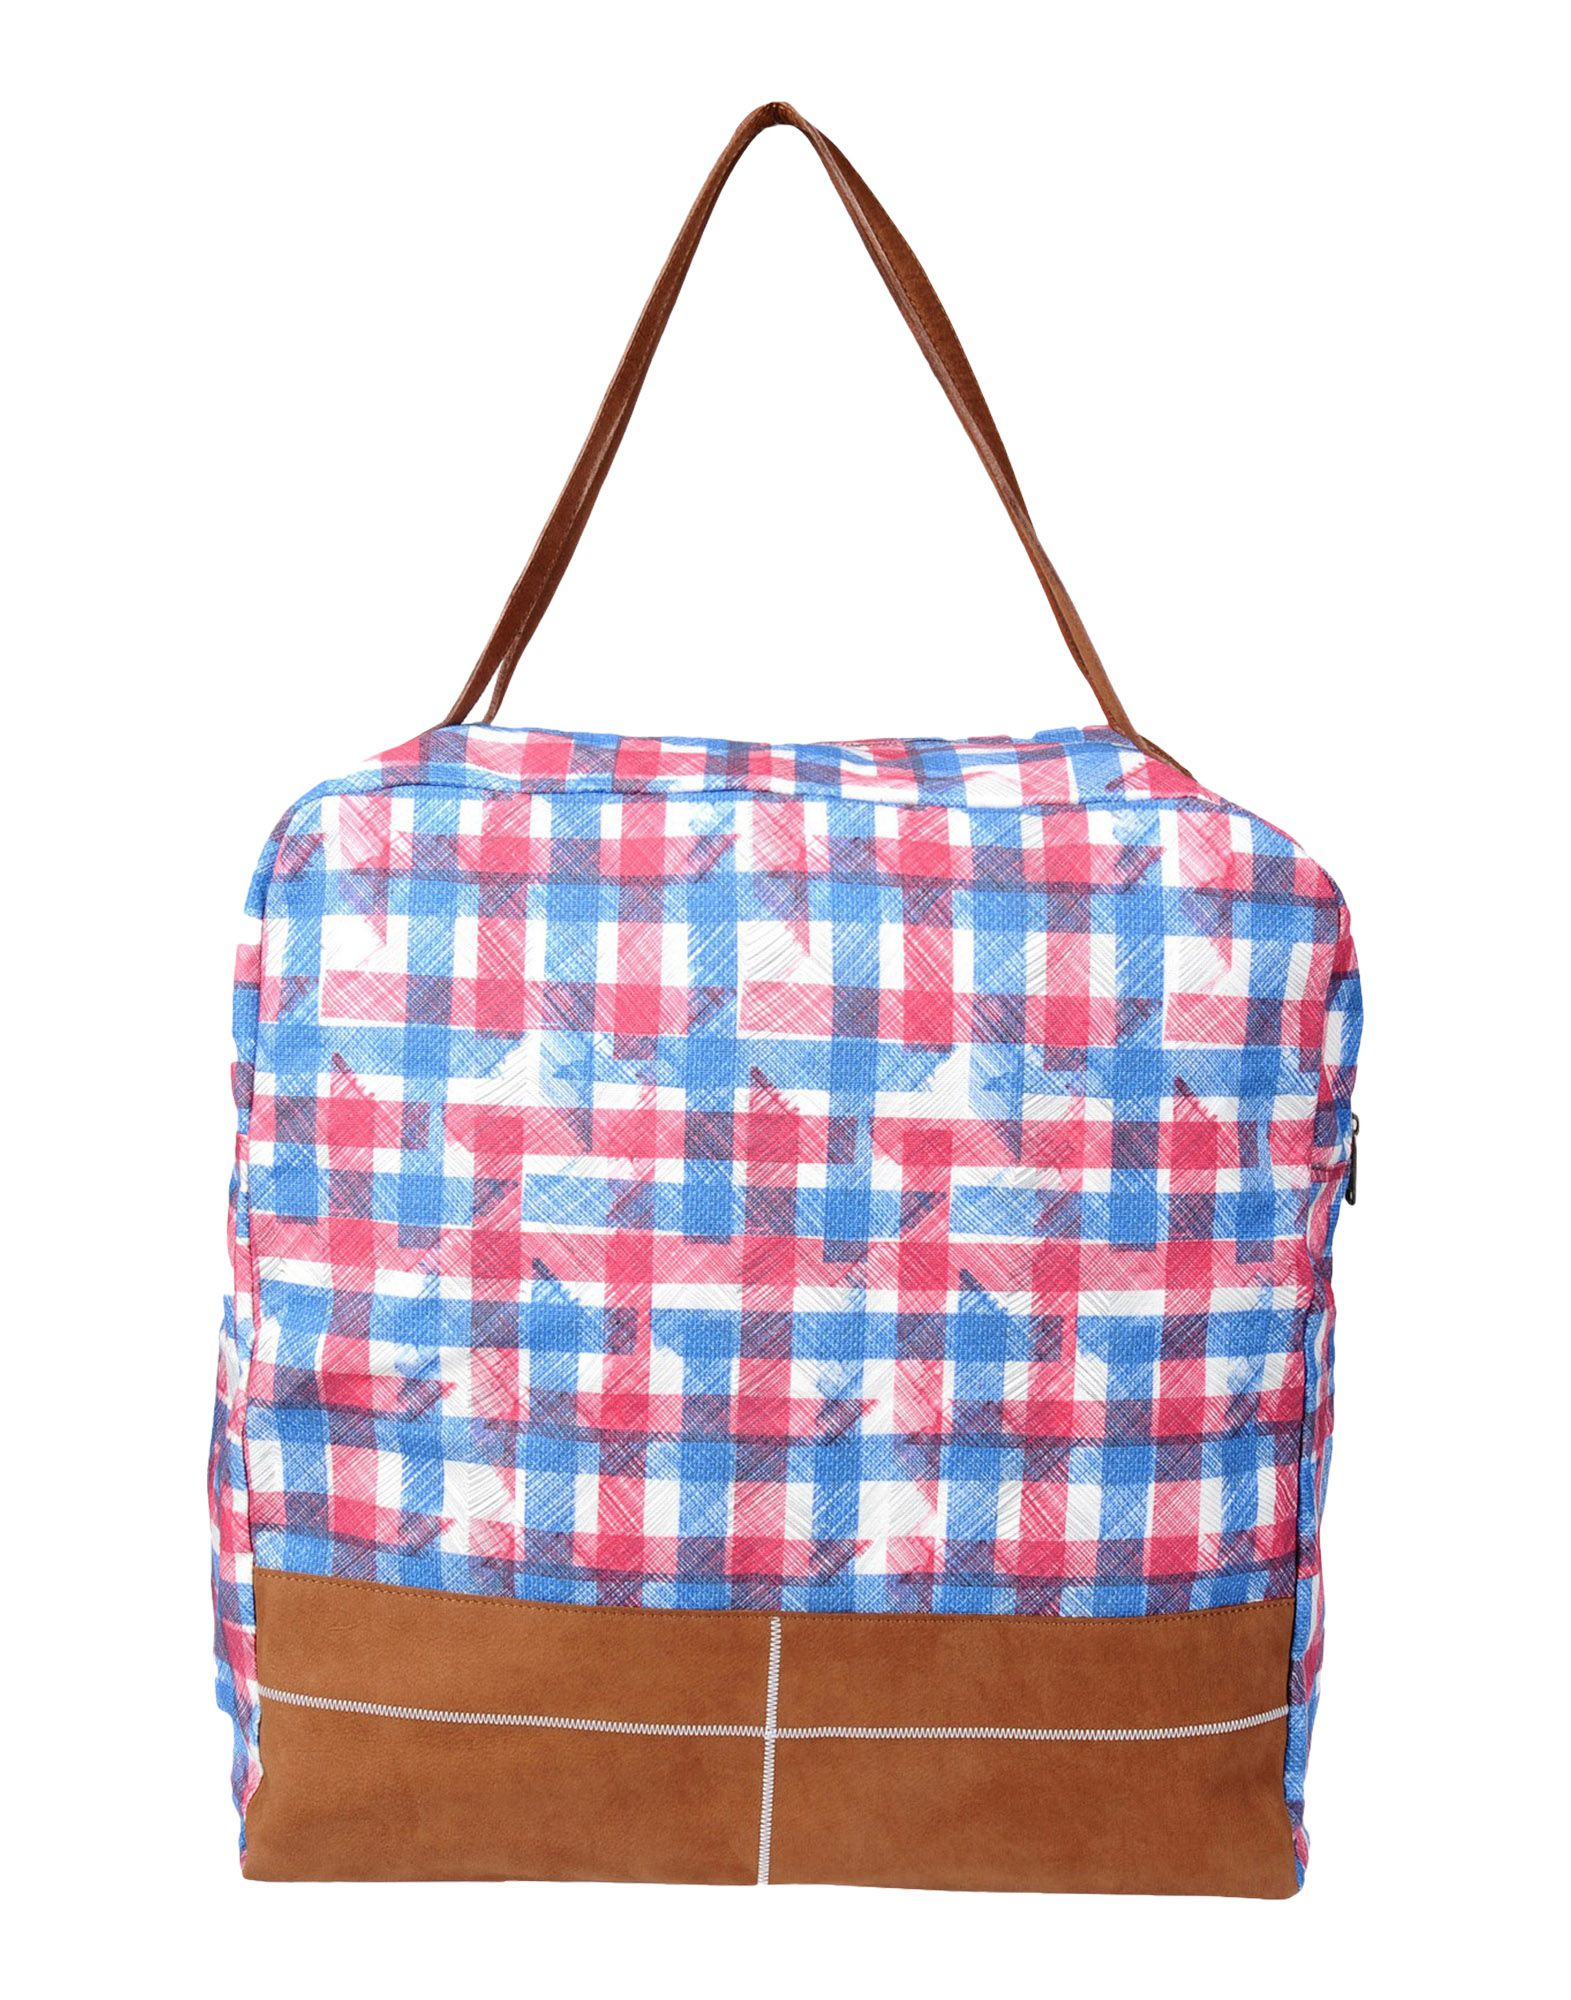 ANDREA INCONTRI Travel & duffel bags